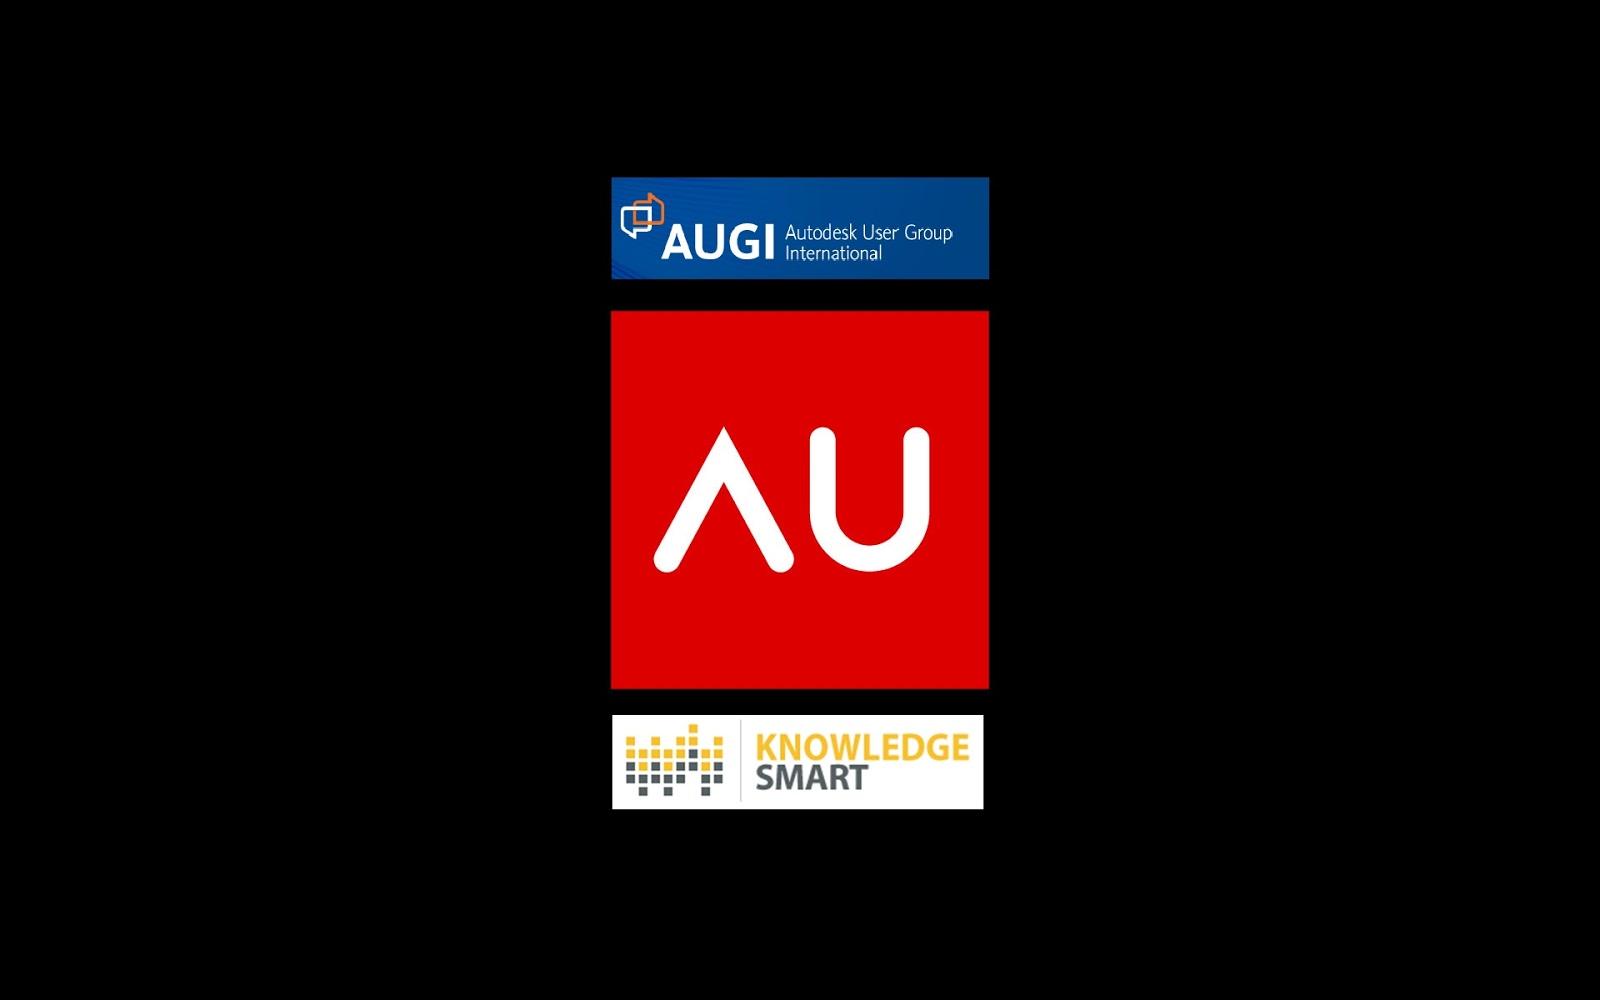 Exhibition Stand Revit : The knowledgesmart